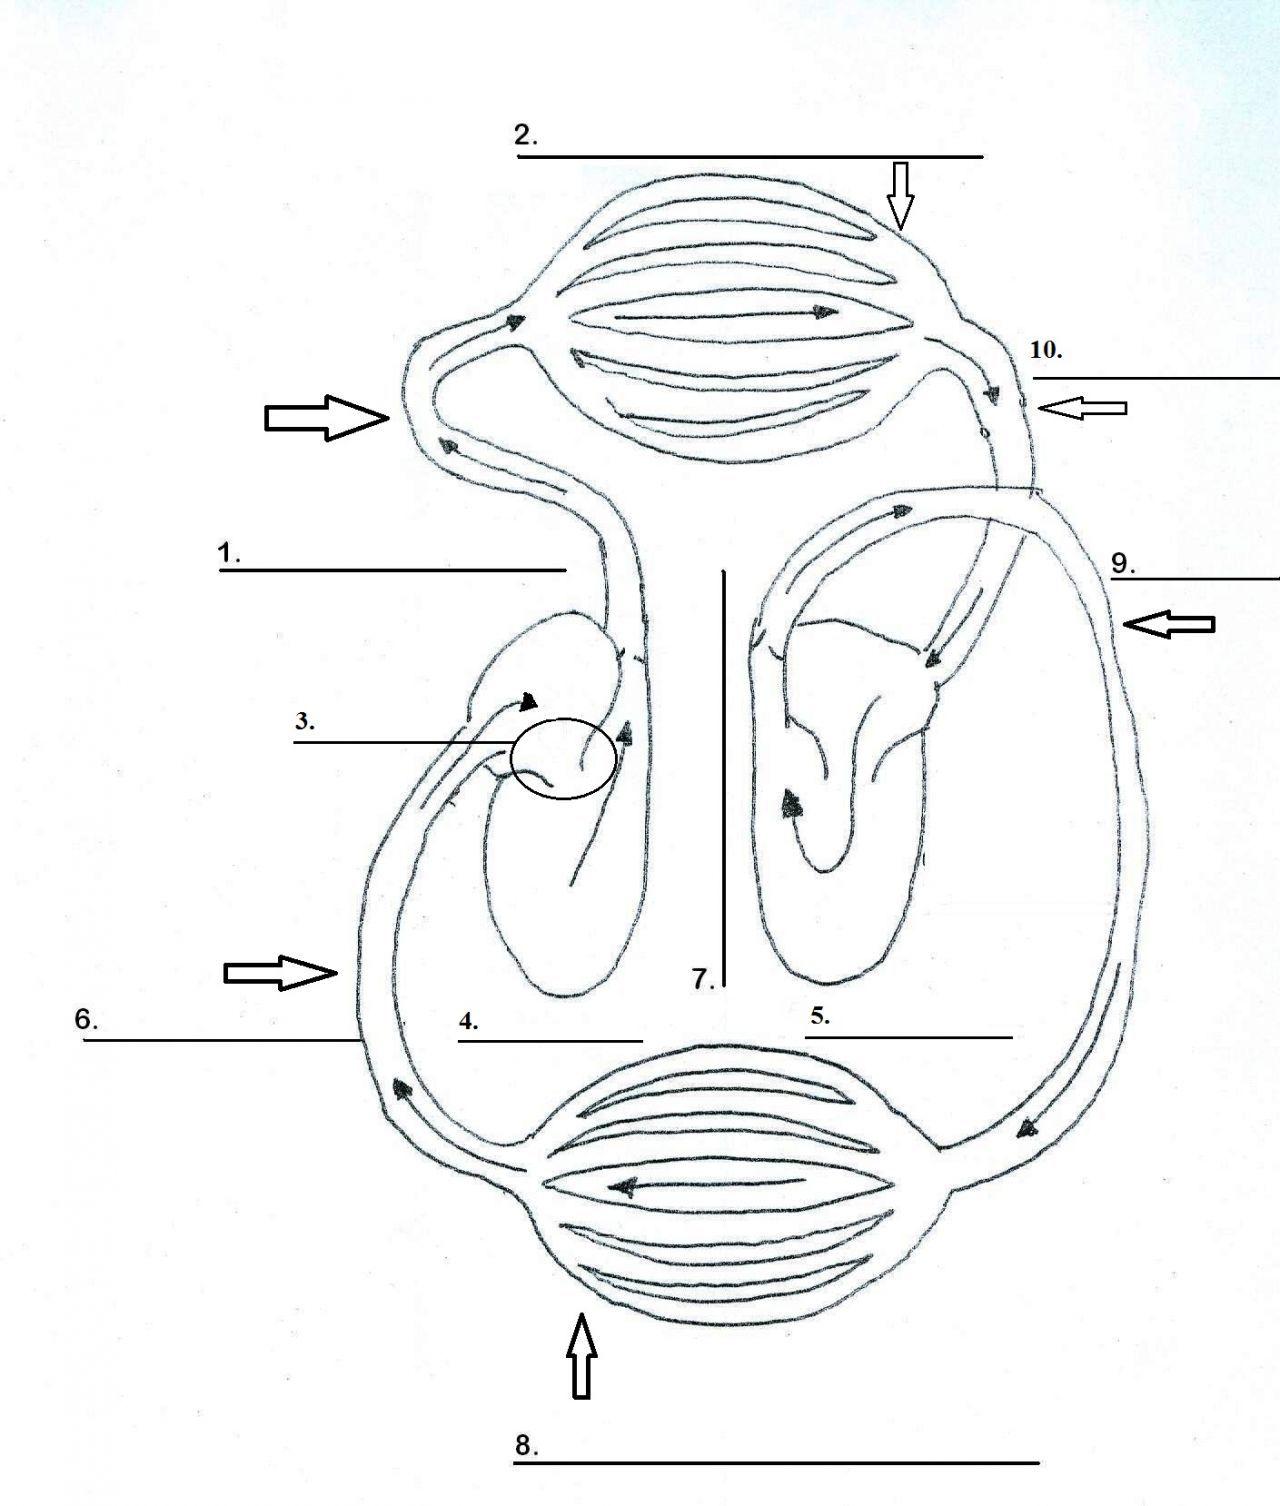 Image Result For Blank Circulatory System Diagram Circulatory